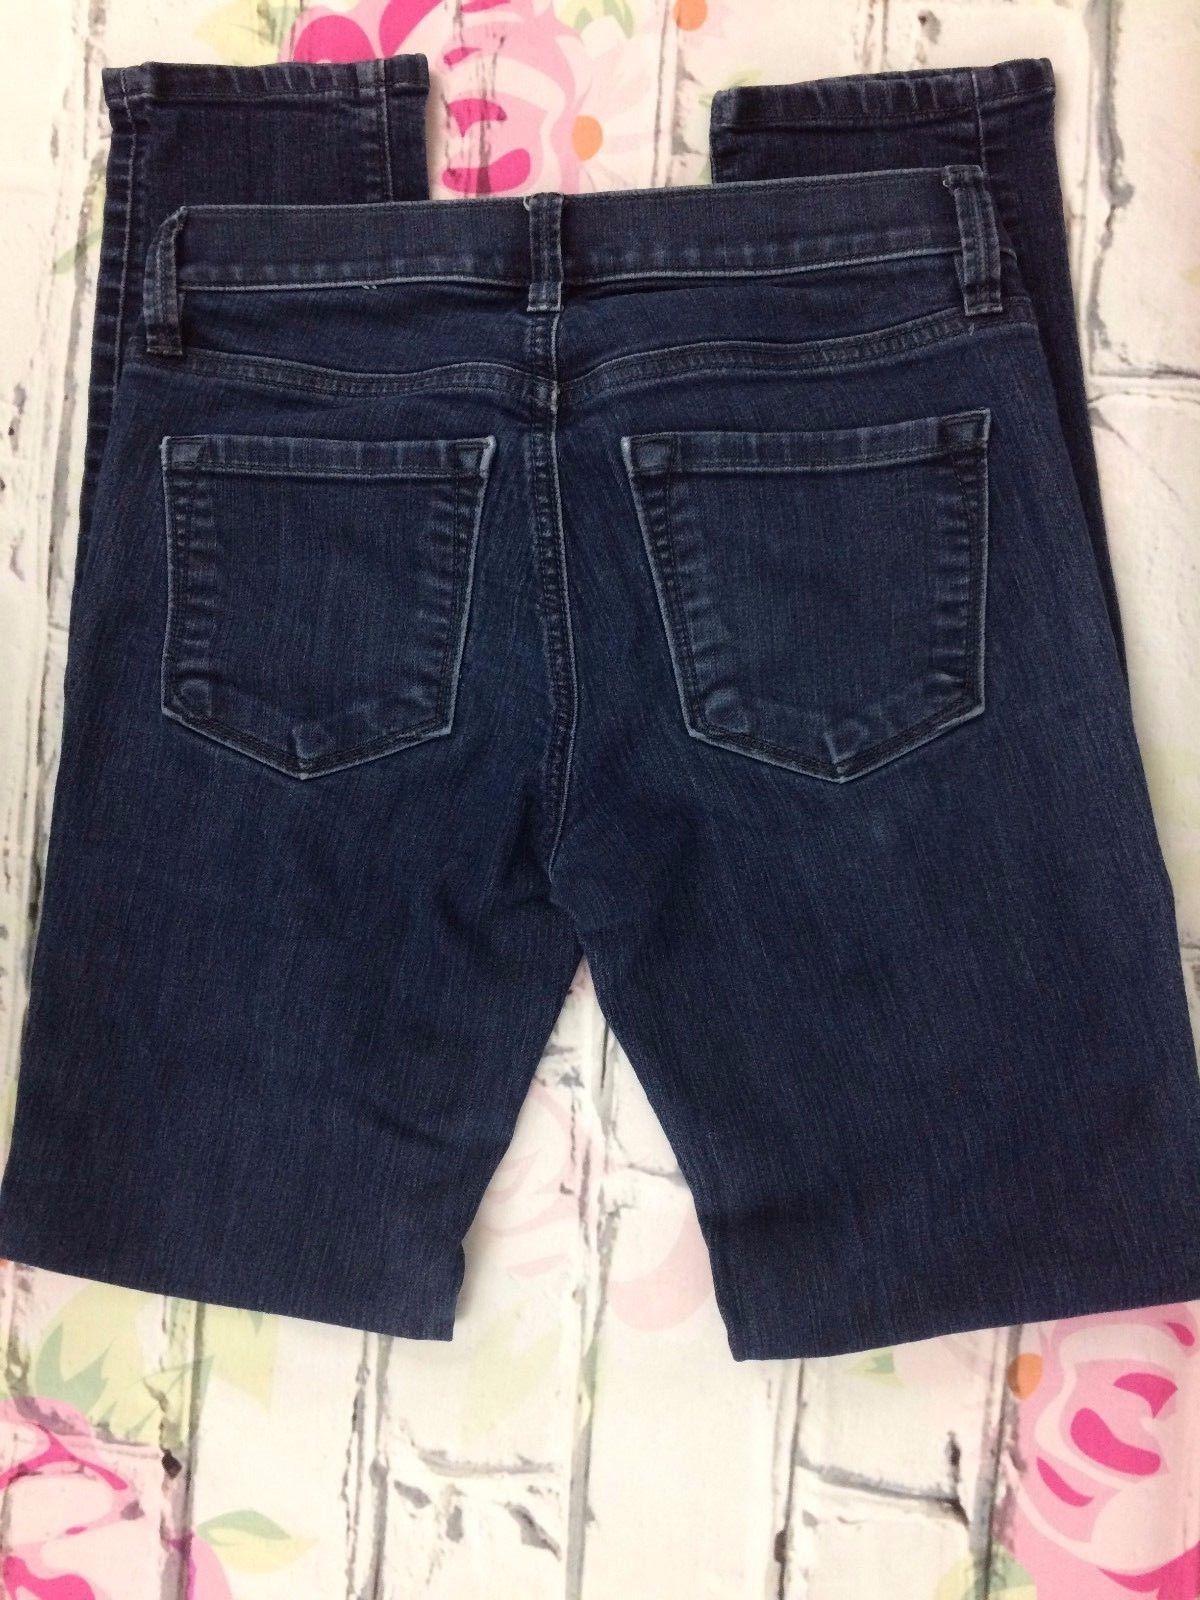 Ann Taylor LOFT Denim Blue Jeans Modern Skinny Stretch Size 26/2